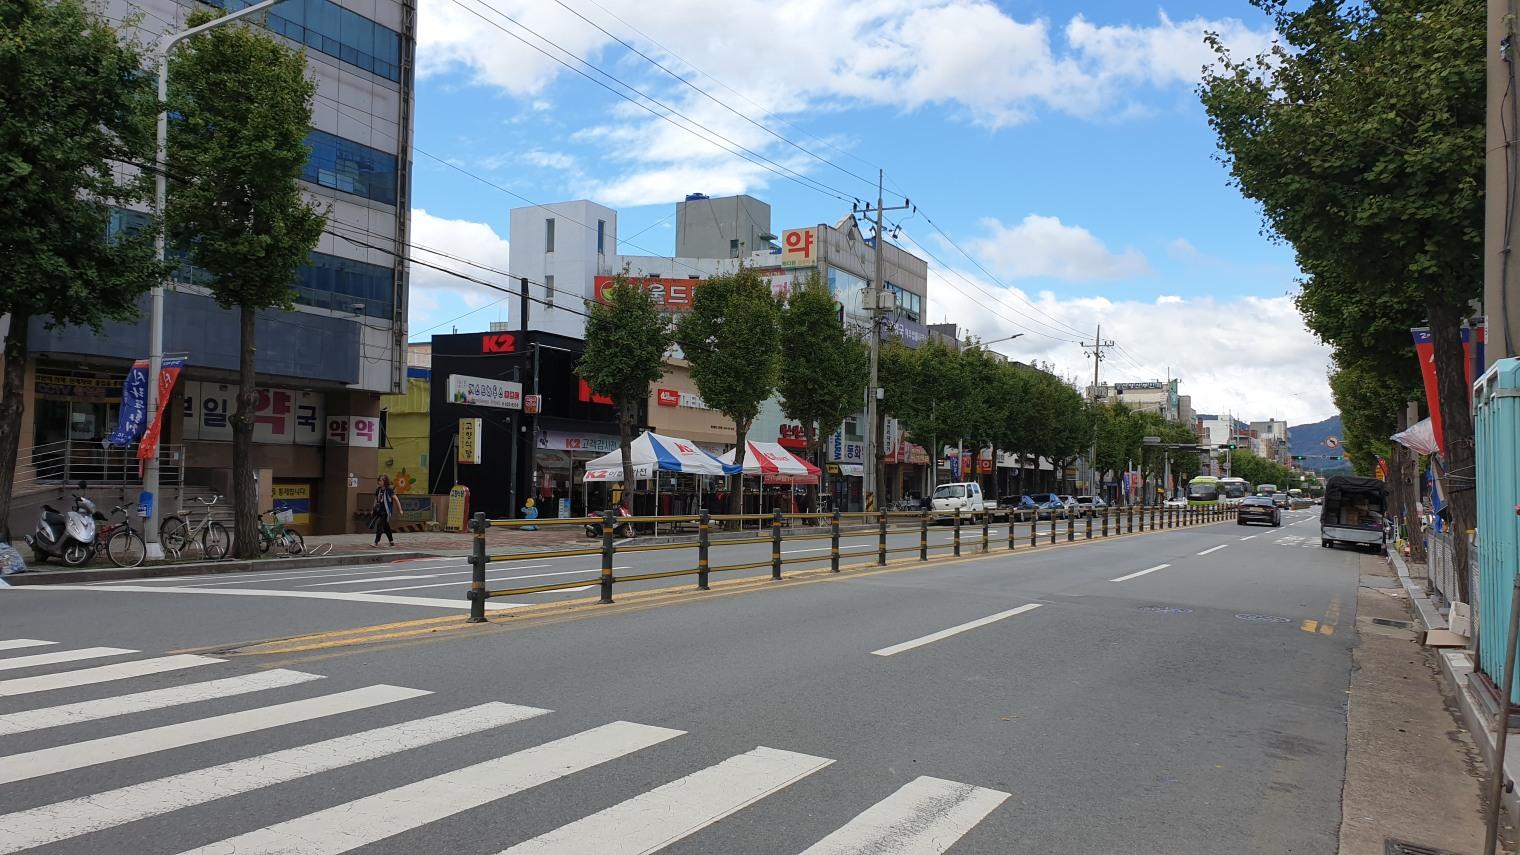 Korea0576